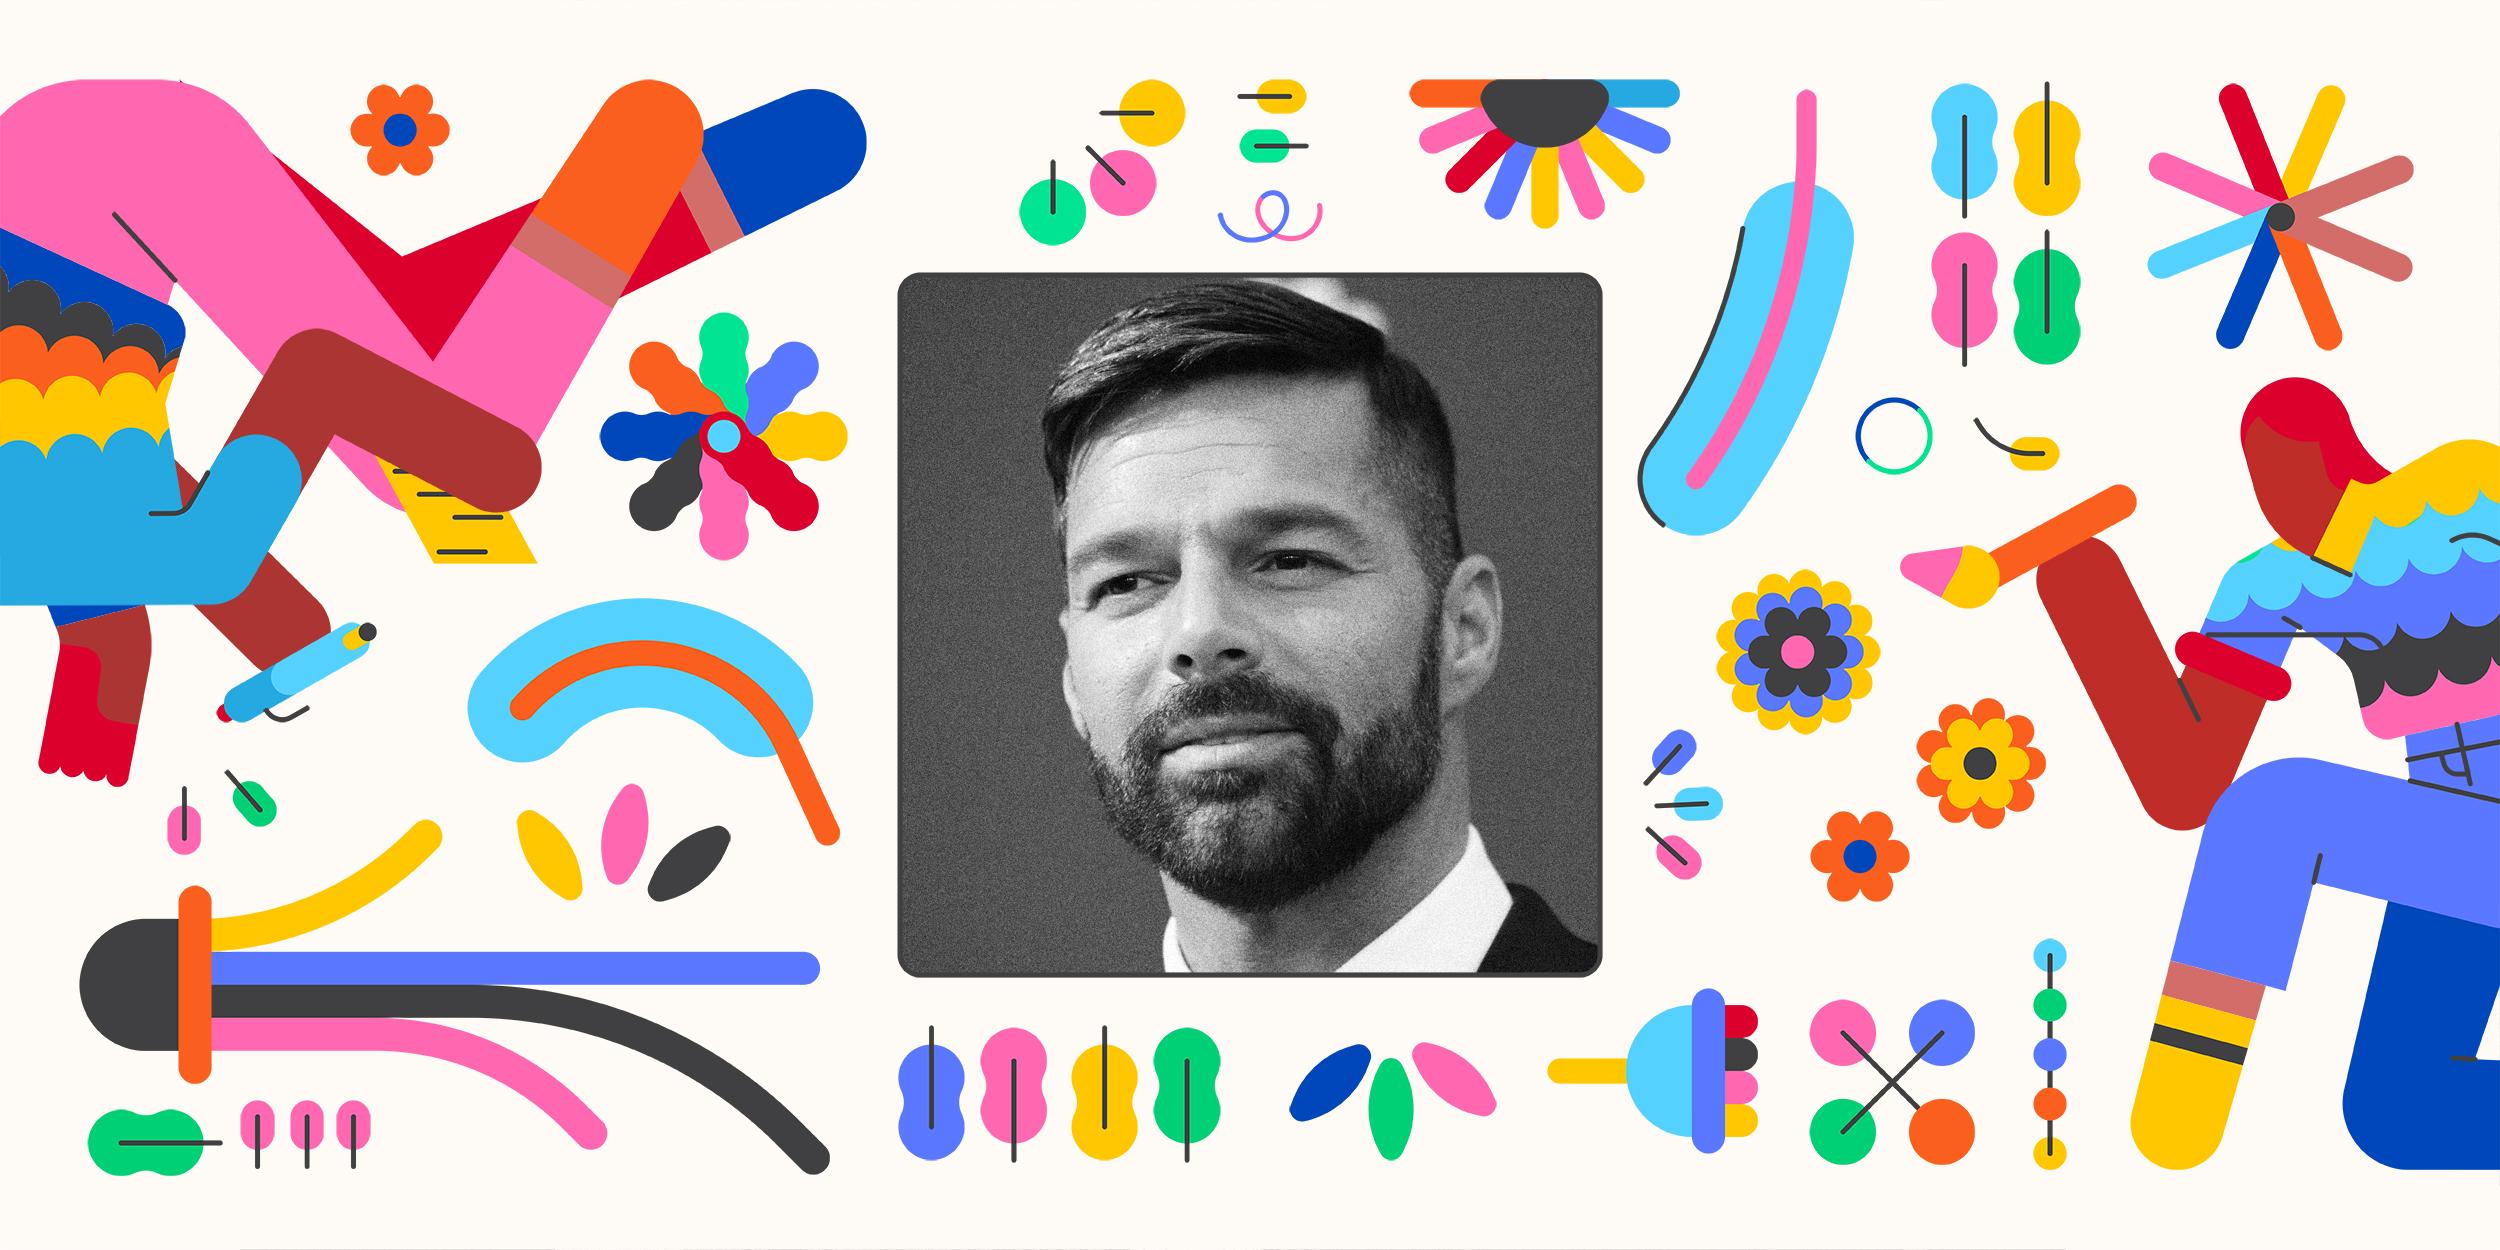 #NBCLatino20: Ricky Martin — Outspoken Advocate